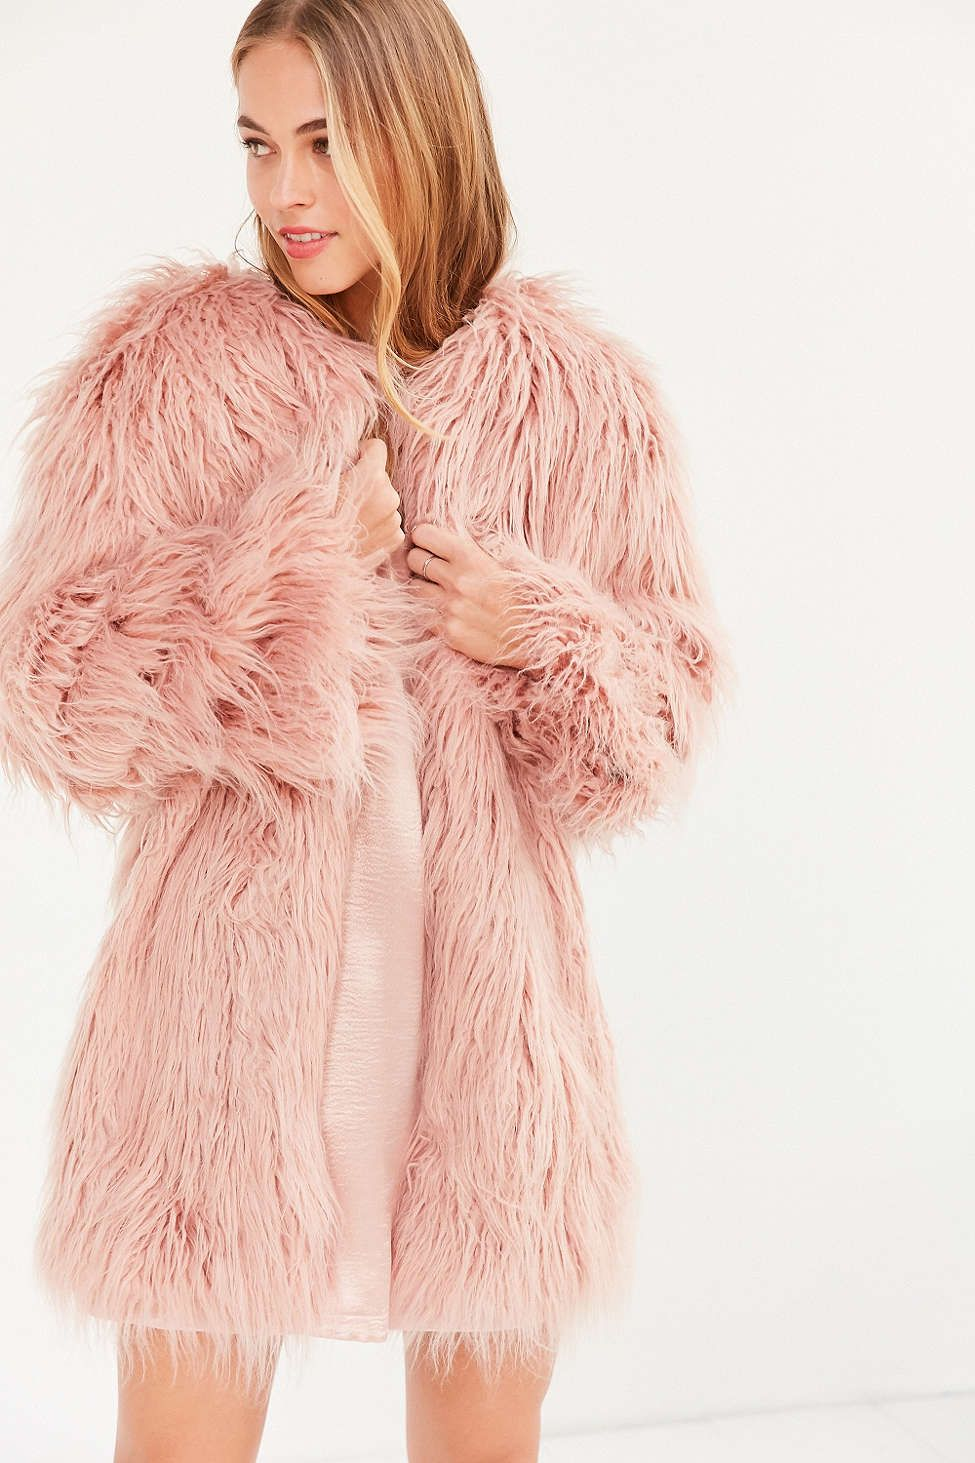 00a75efca0 Kimchi Blue Stella Shaggy Faux Fur Coat - Urban Outfitters | New ...